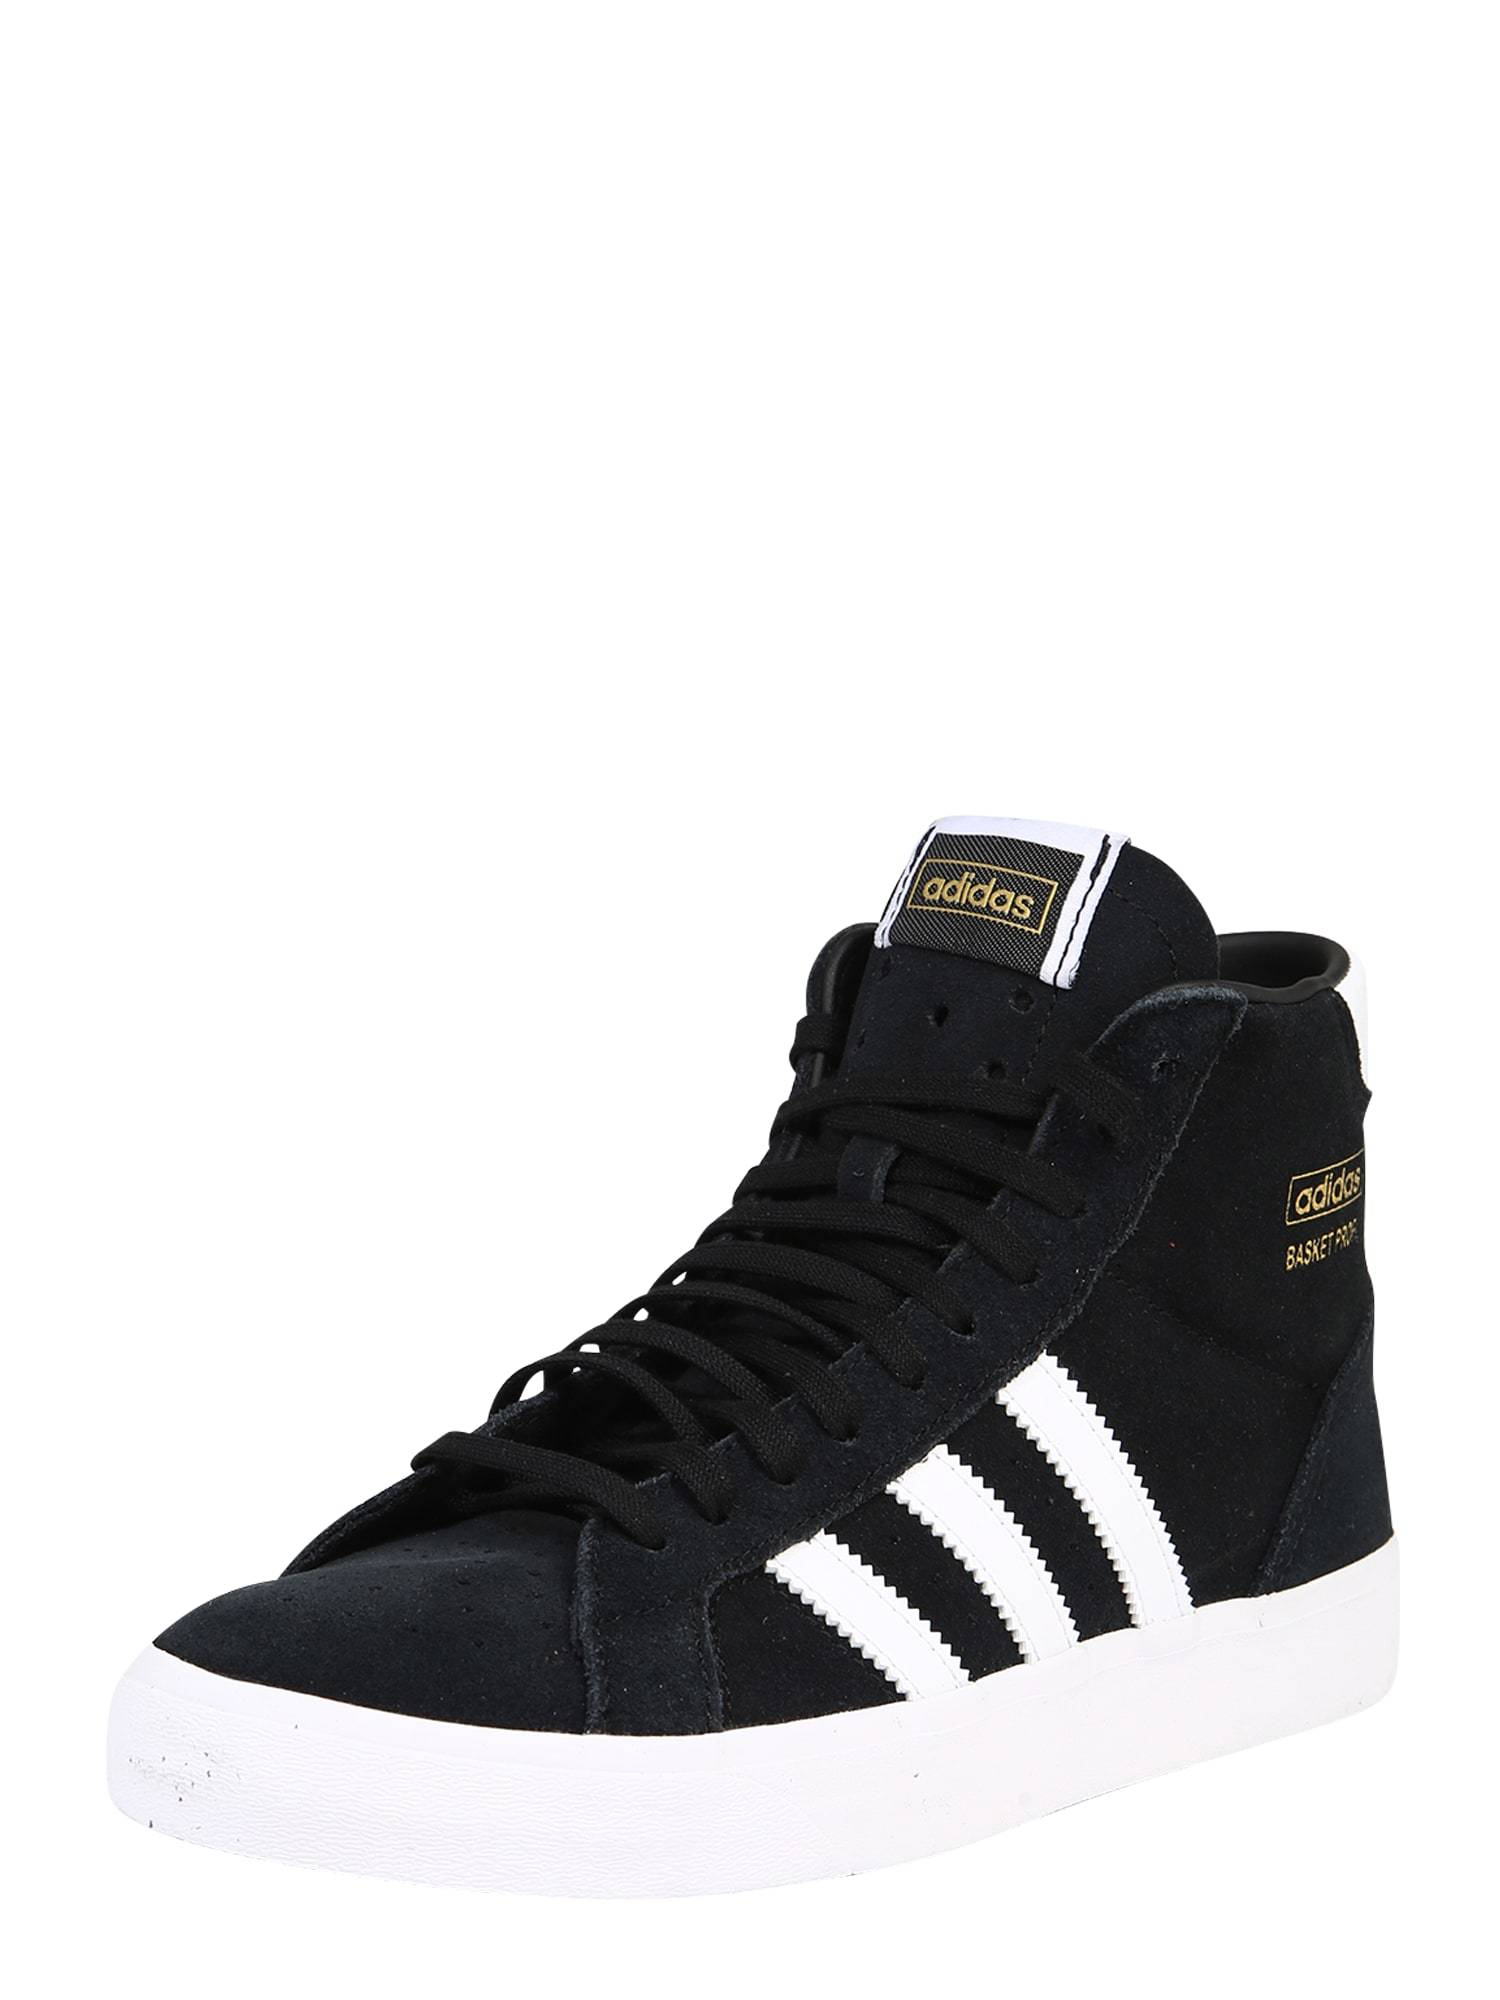 ADIDAS ORIGINALS Sneaker 'Basket Profi' Nero